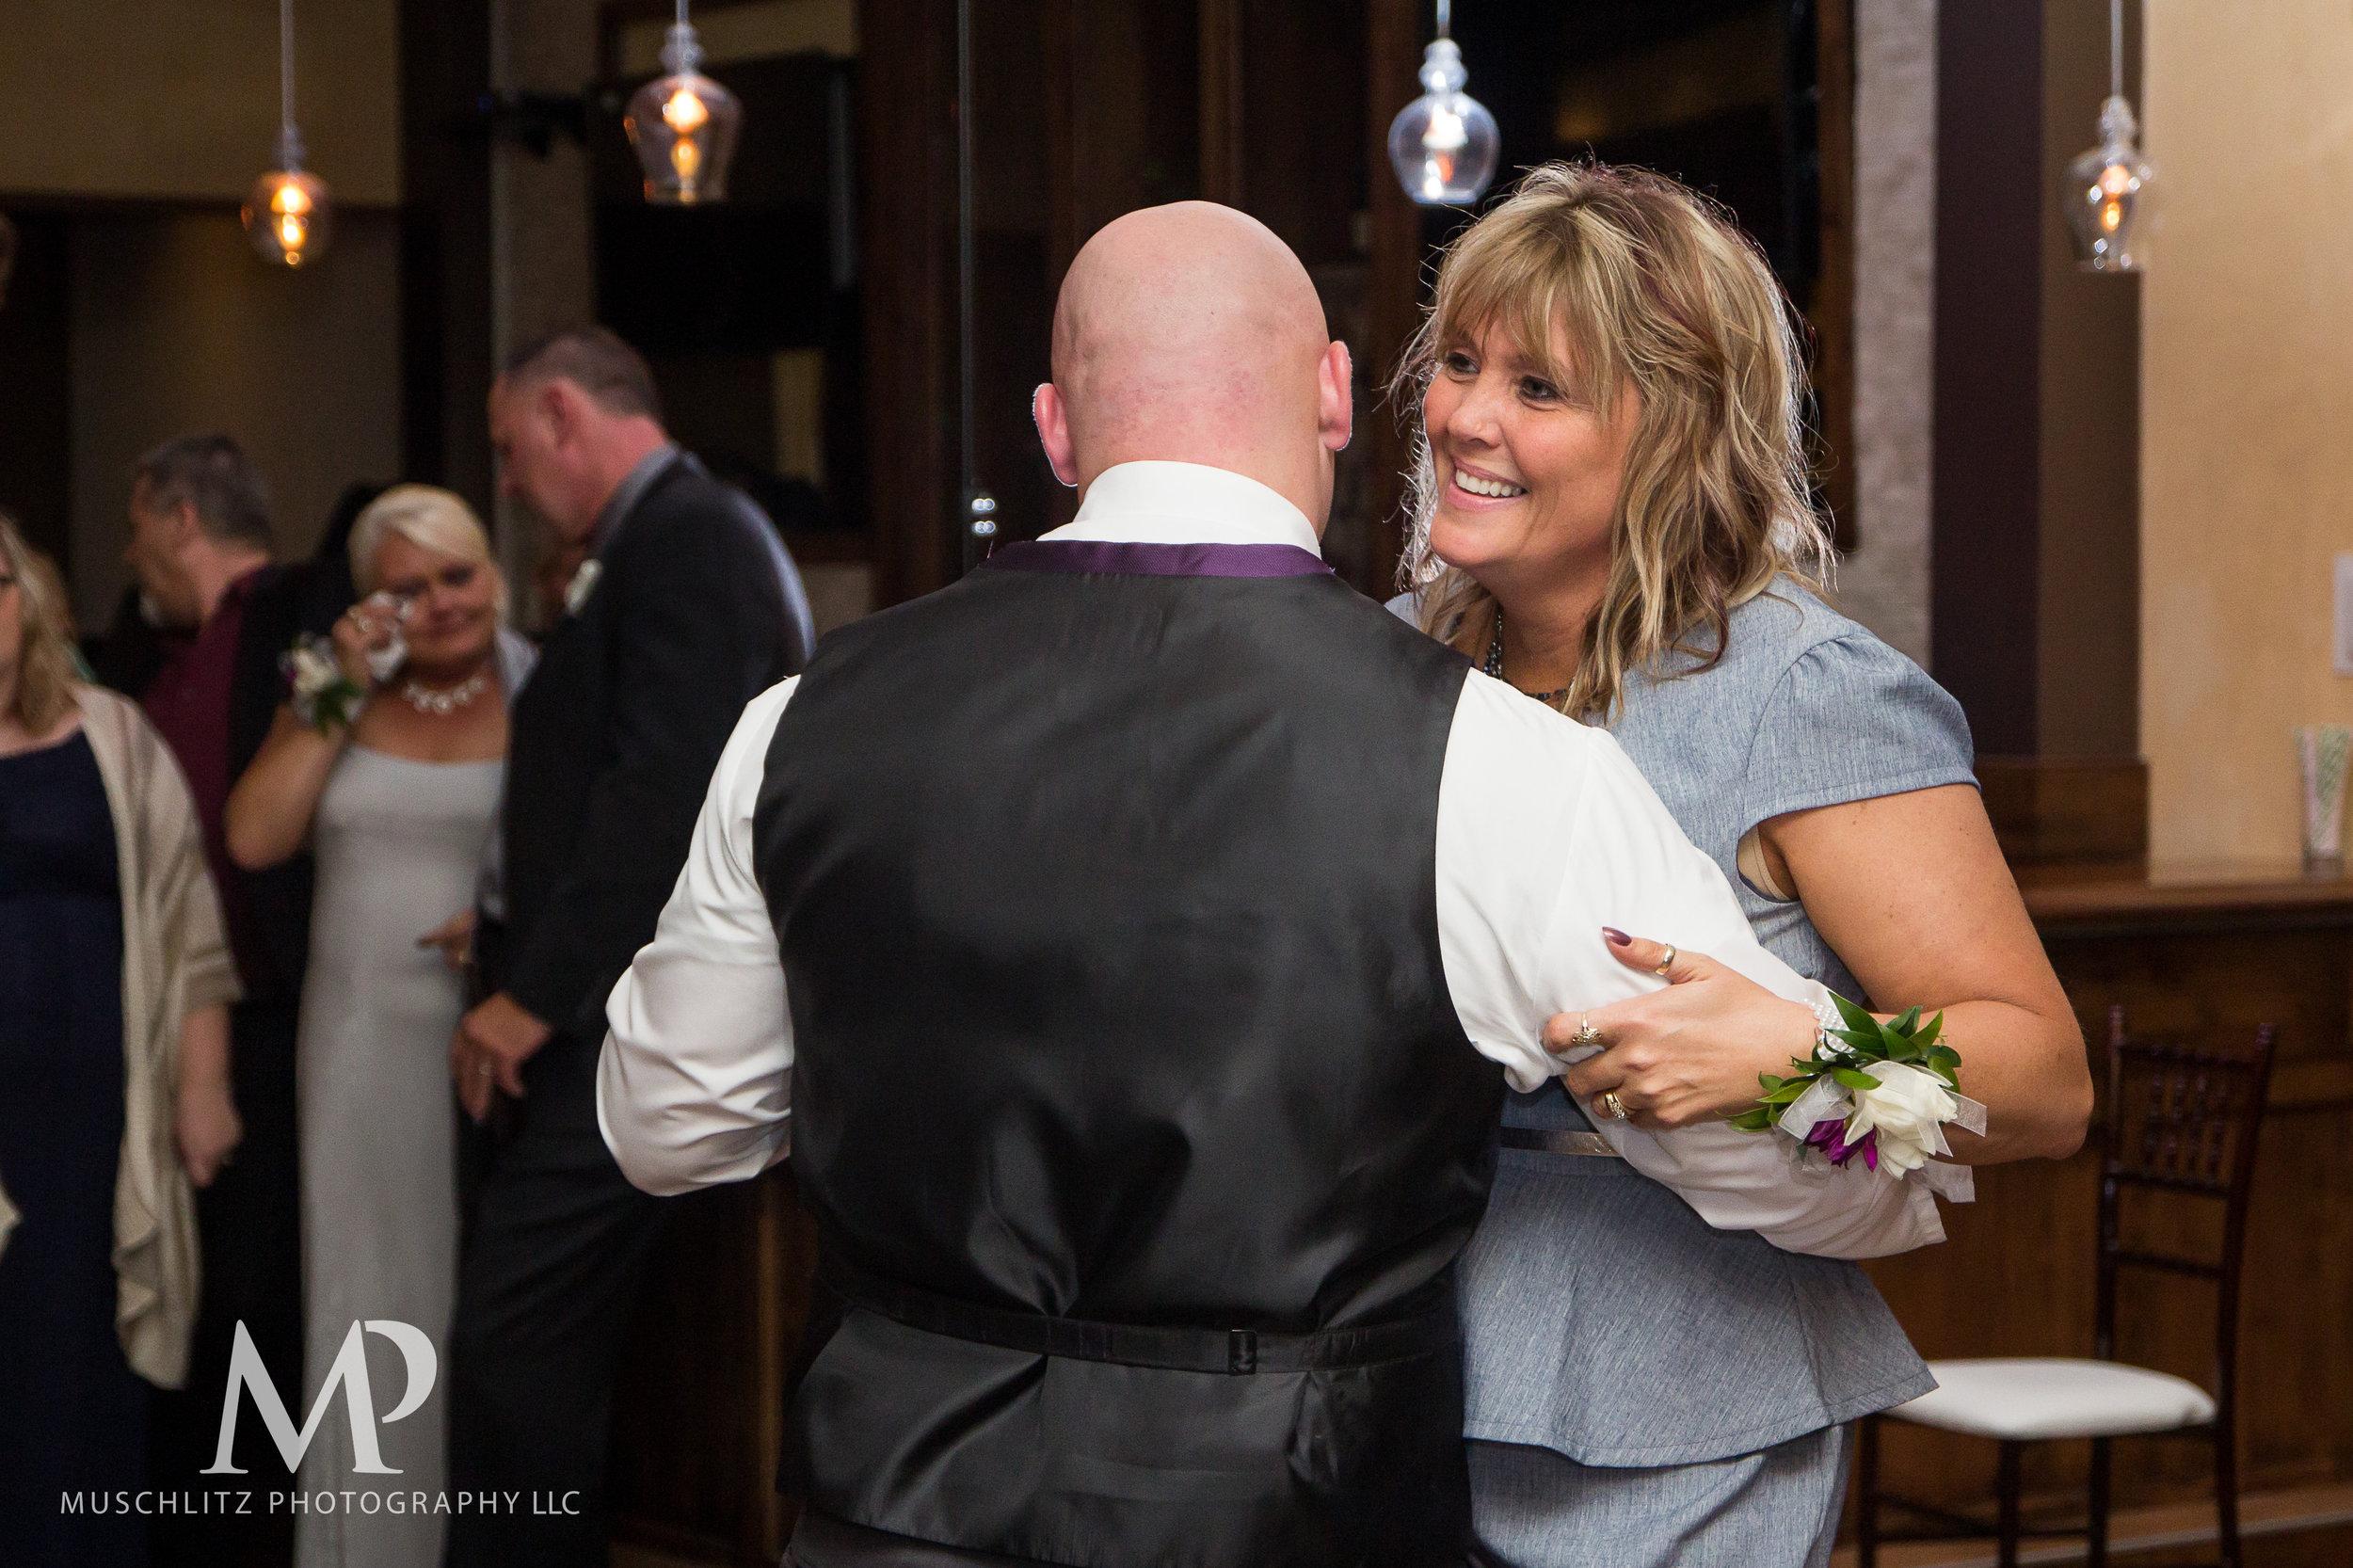 club-at-corazon-wedding-ceremony-reception-columbus-dublin-ohio-ohio-university-theme-086.JPG